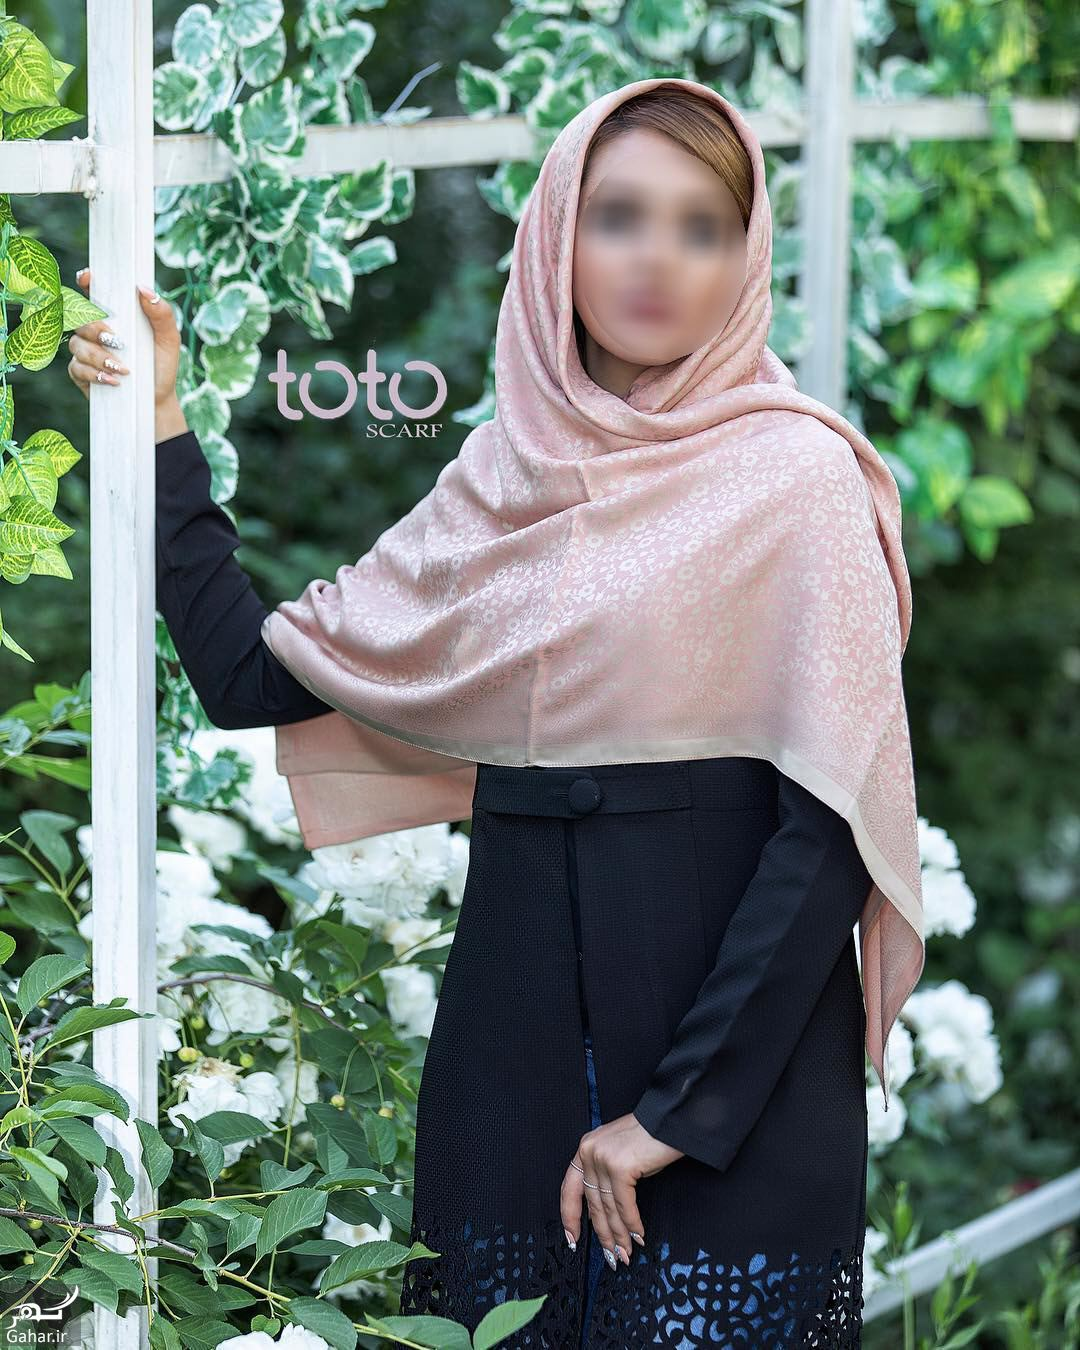 096120 Gahar ir جدیدترین مدل های شال و روسری از برند ایرانی توتو